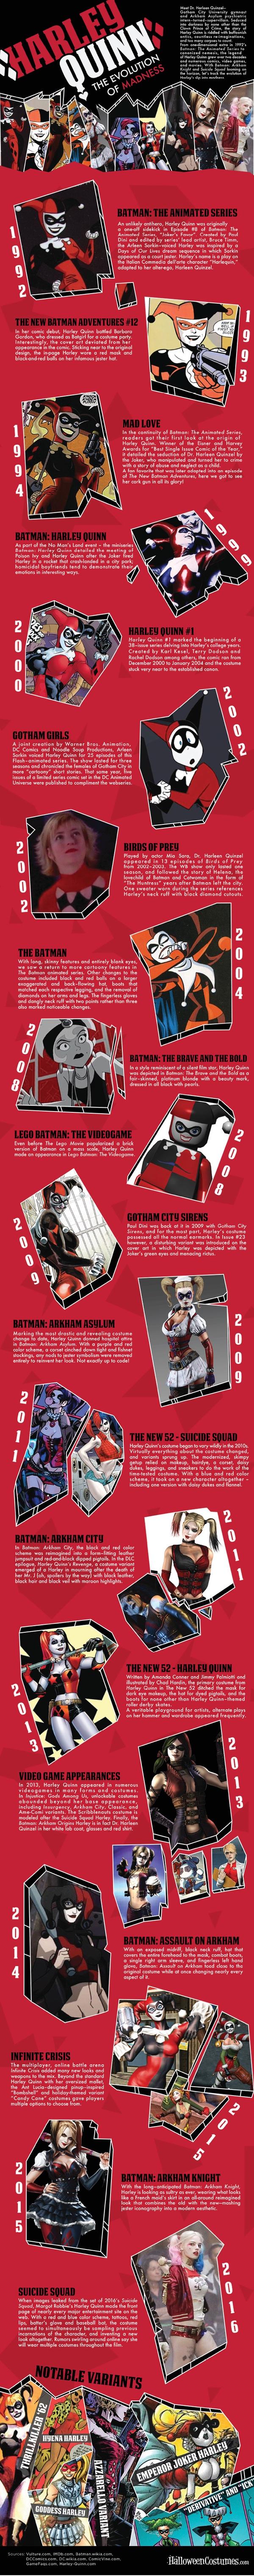 Harley Quinn History.jpg